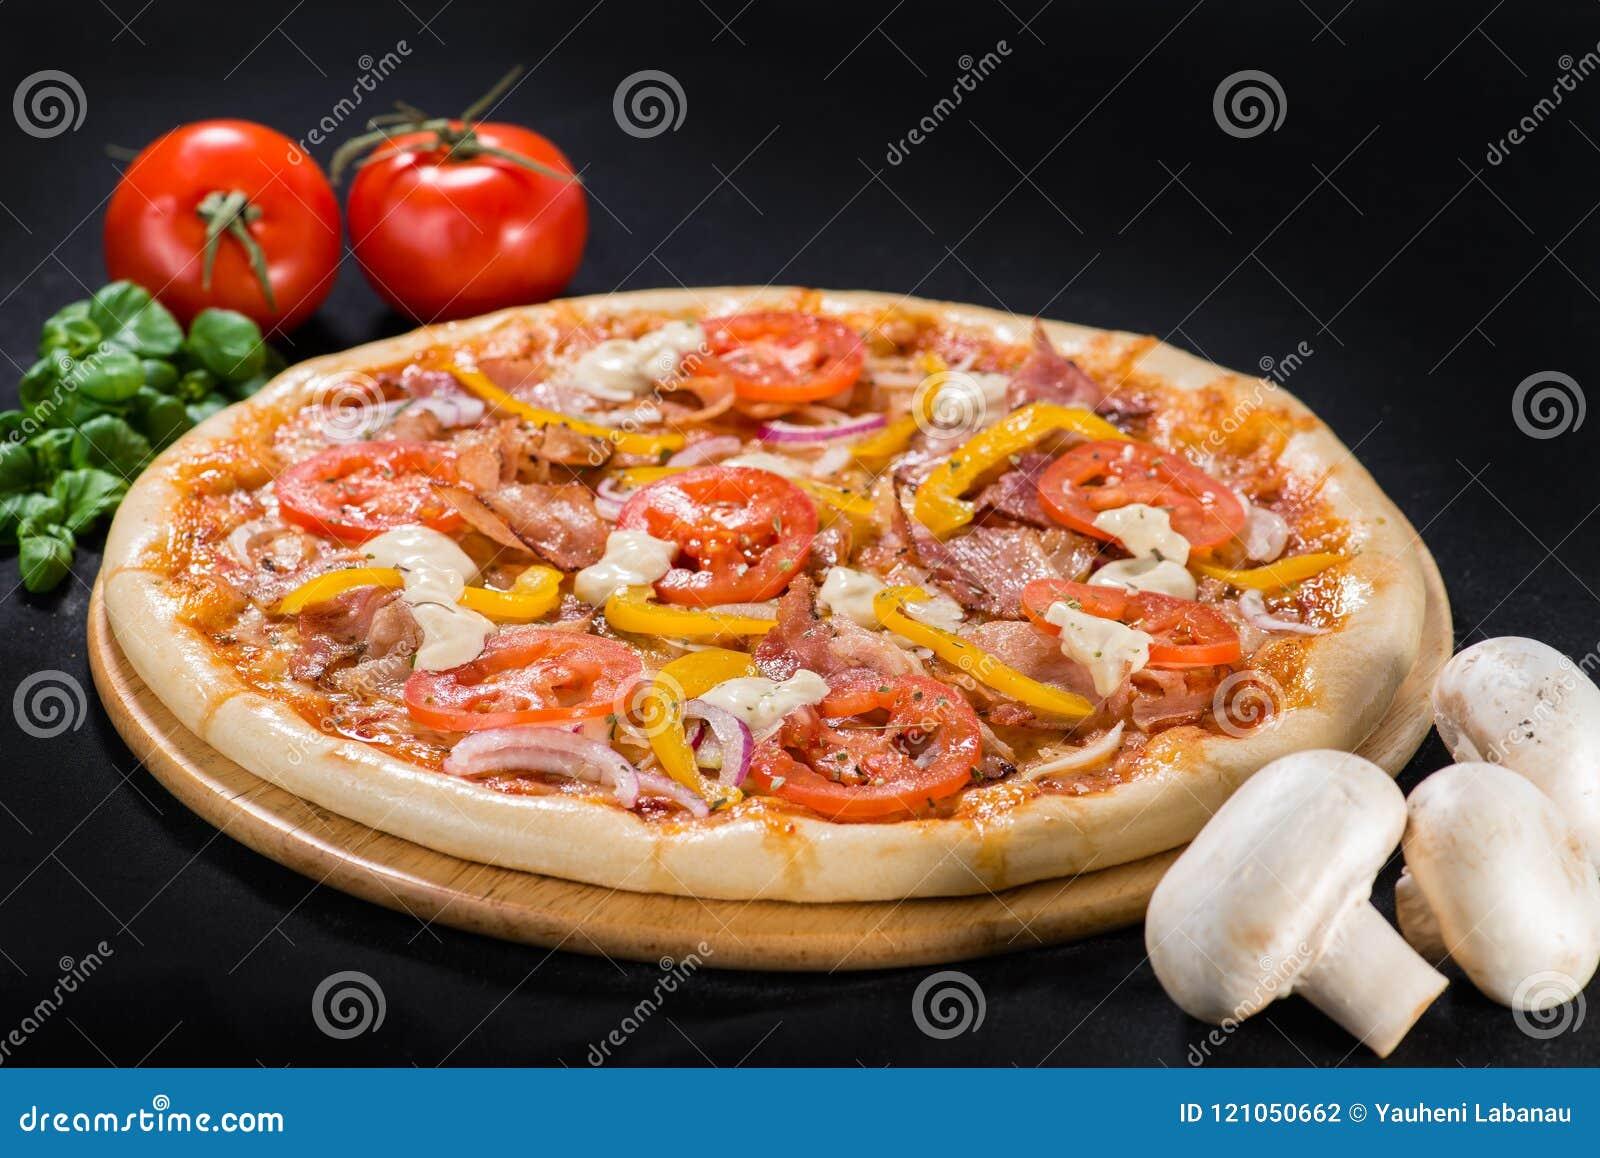 Pizza de luxe avec du mozzarella, salami, lard, oignon, tomates